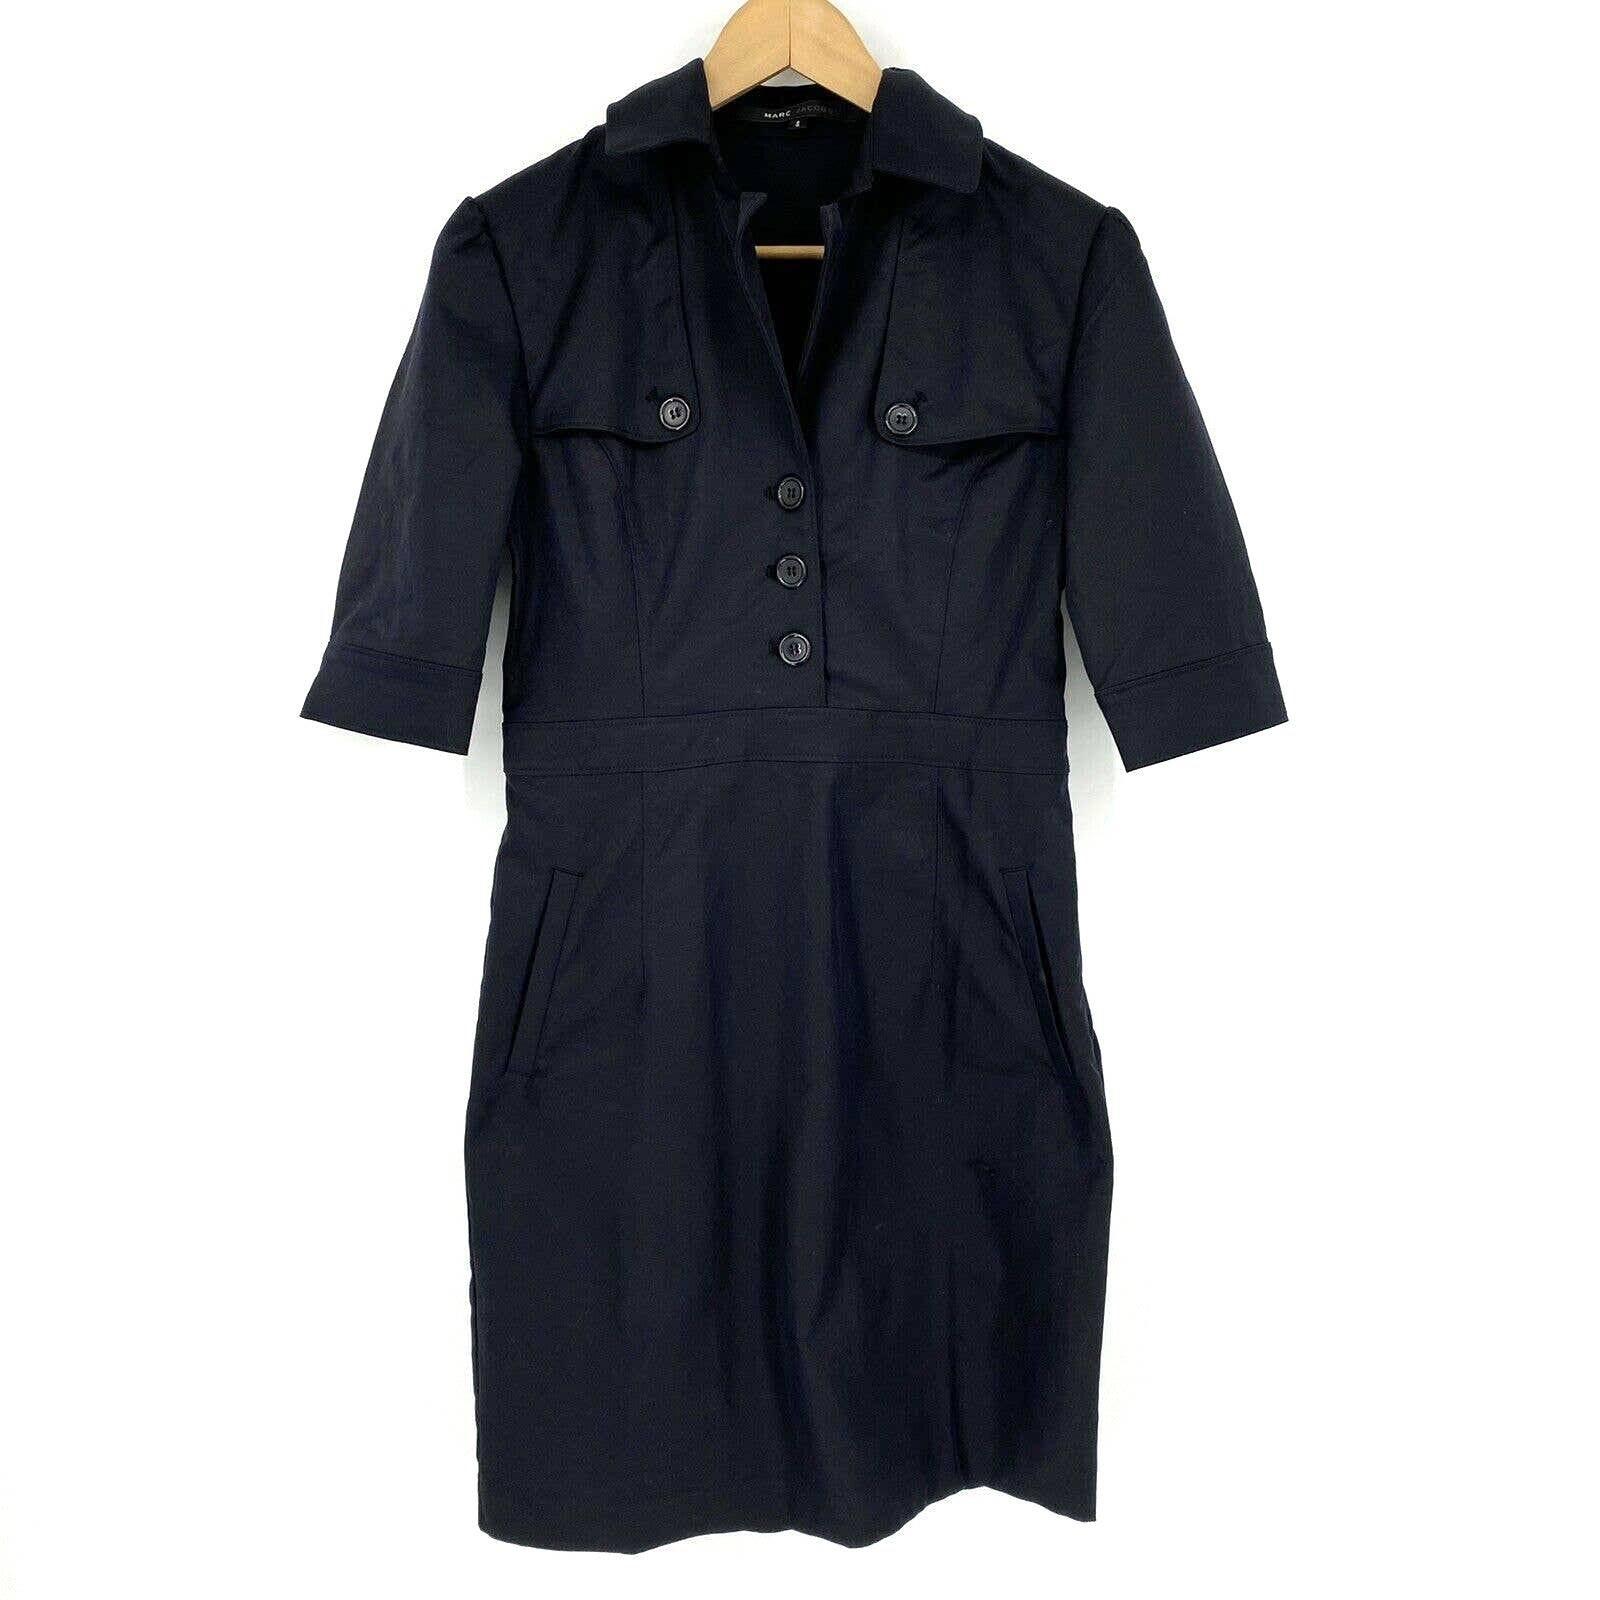 Marc Jacobs Shirt Dress Sheath Stretch